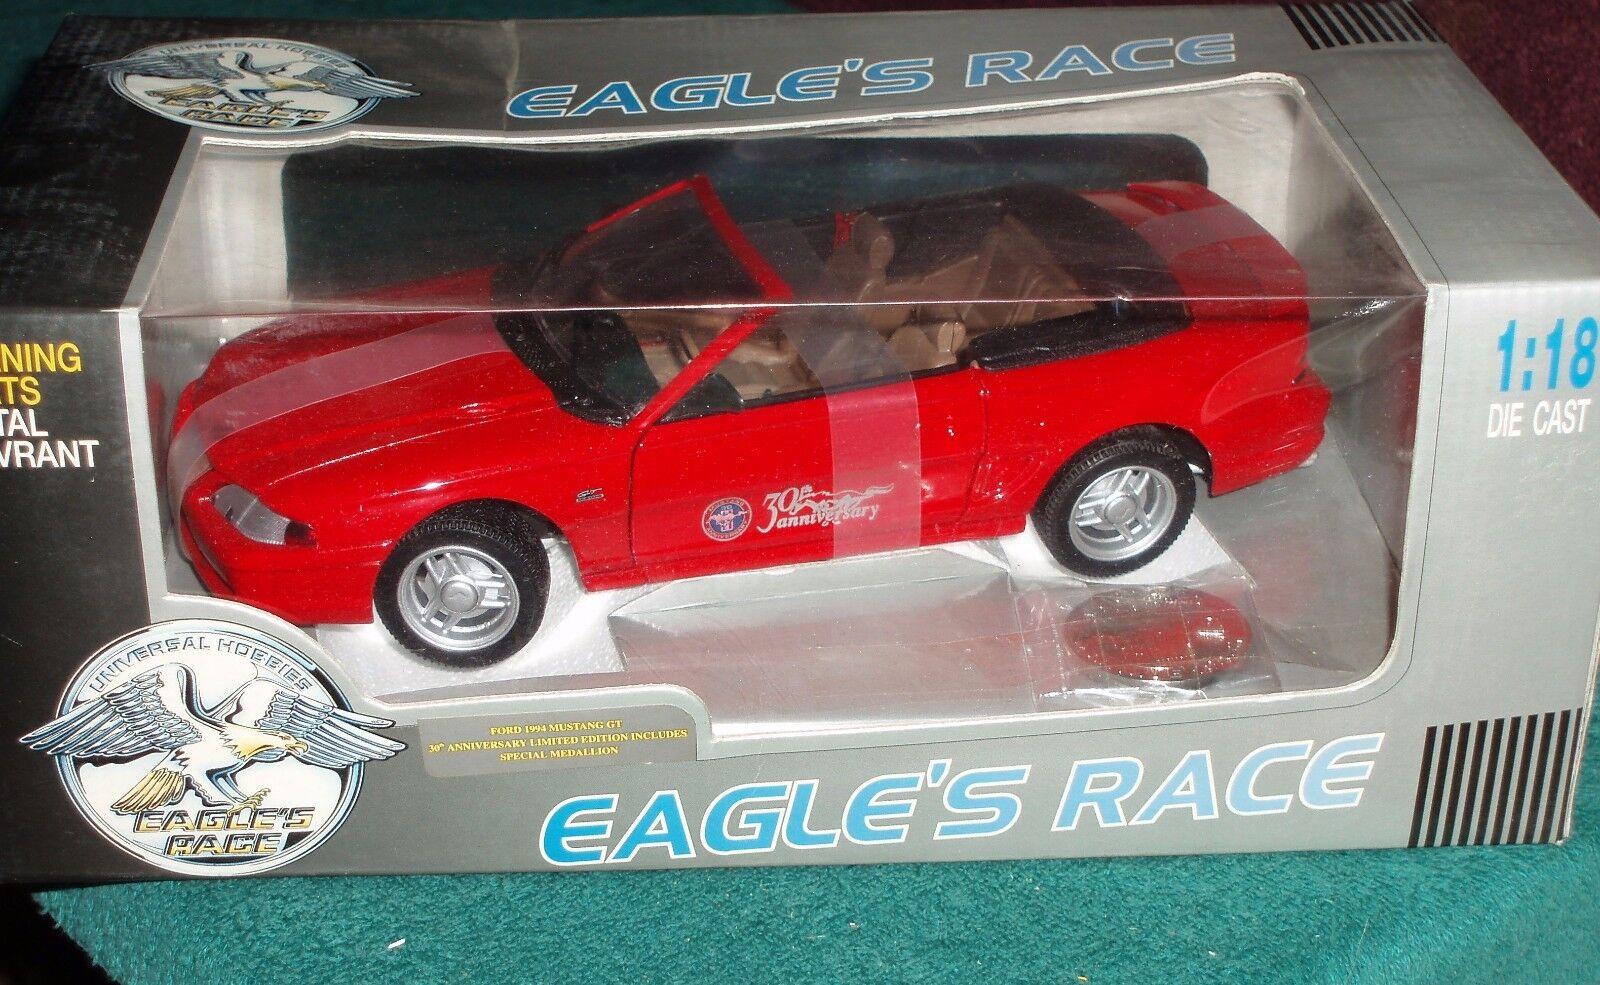 Adler ist race 1994 ford mustang gt conv 1   18. rot   blk zum 30. jahrestag der nib